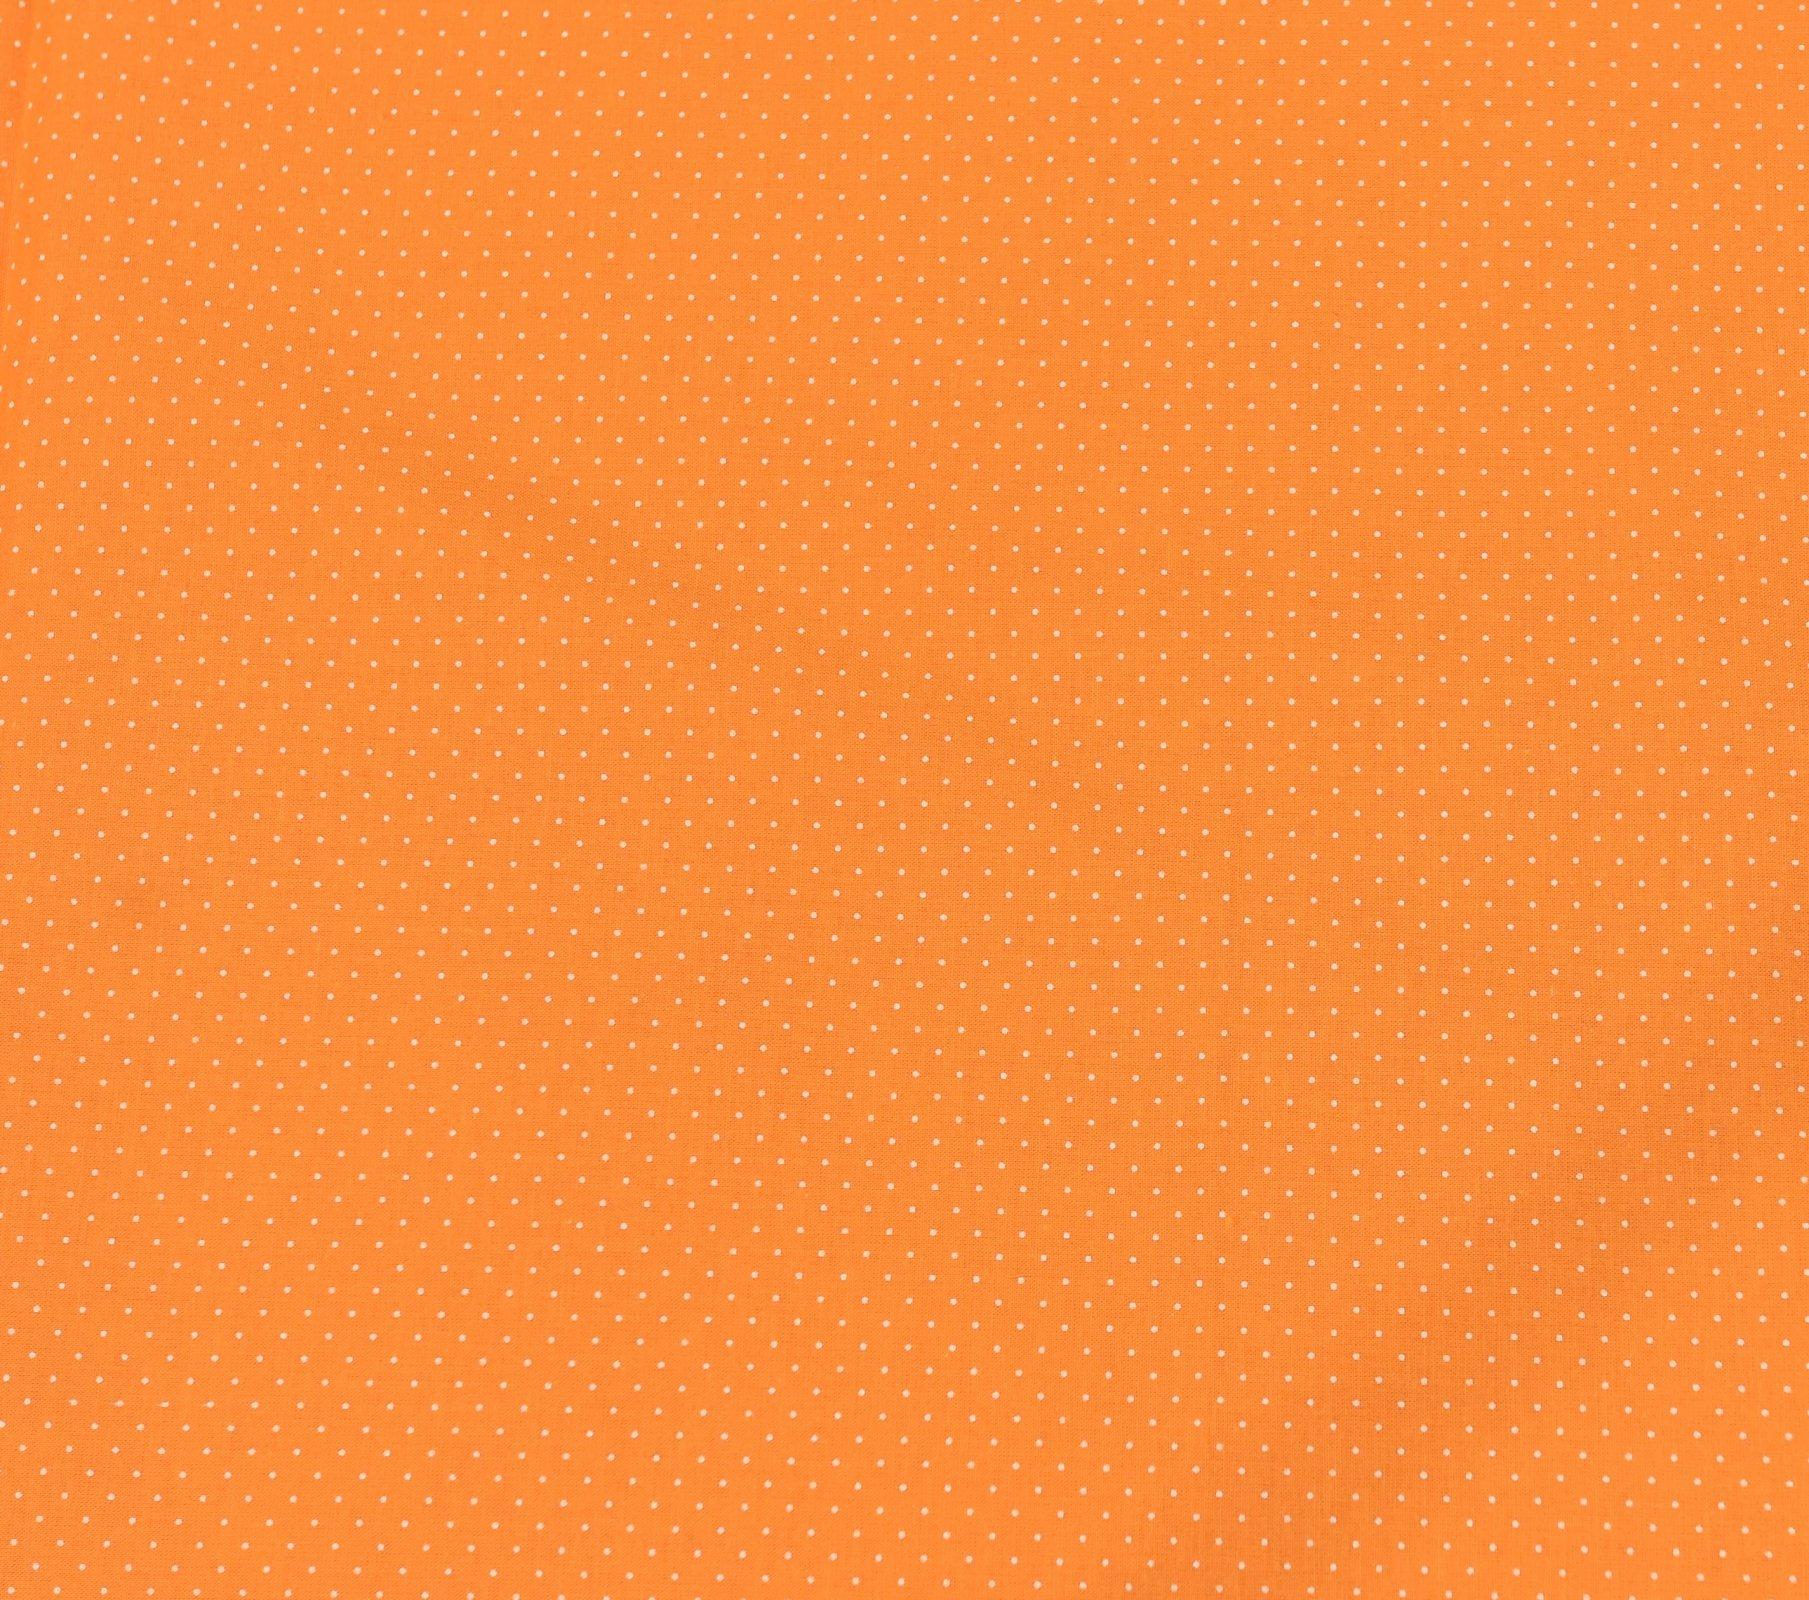 Handworks - Micro Spot - Orange